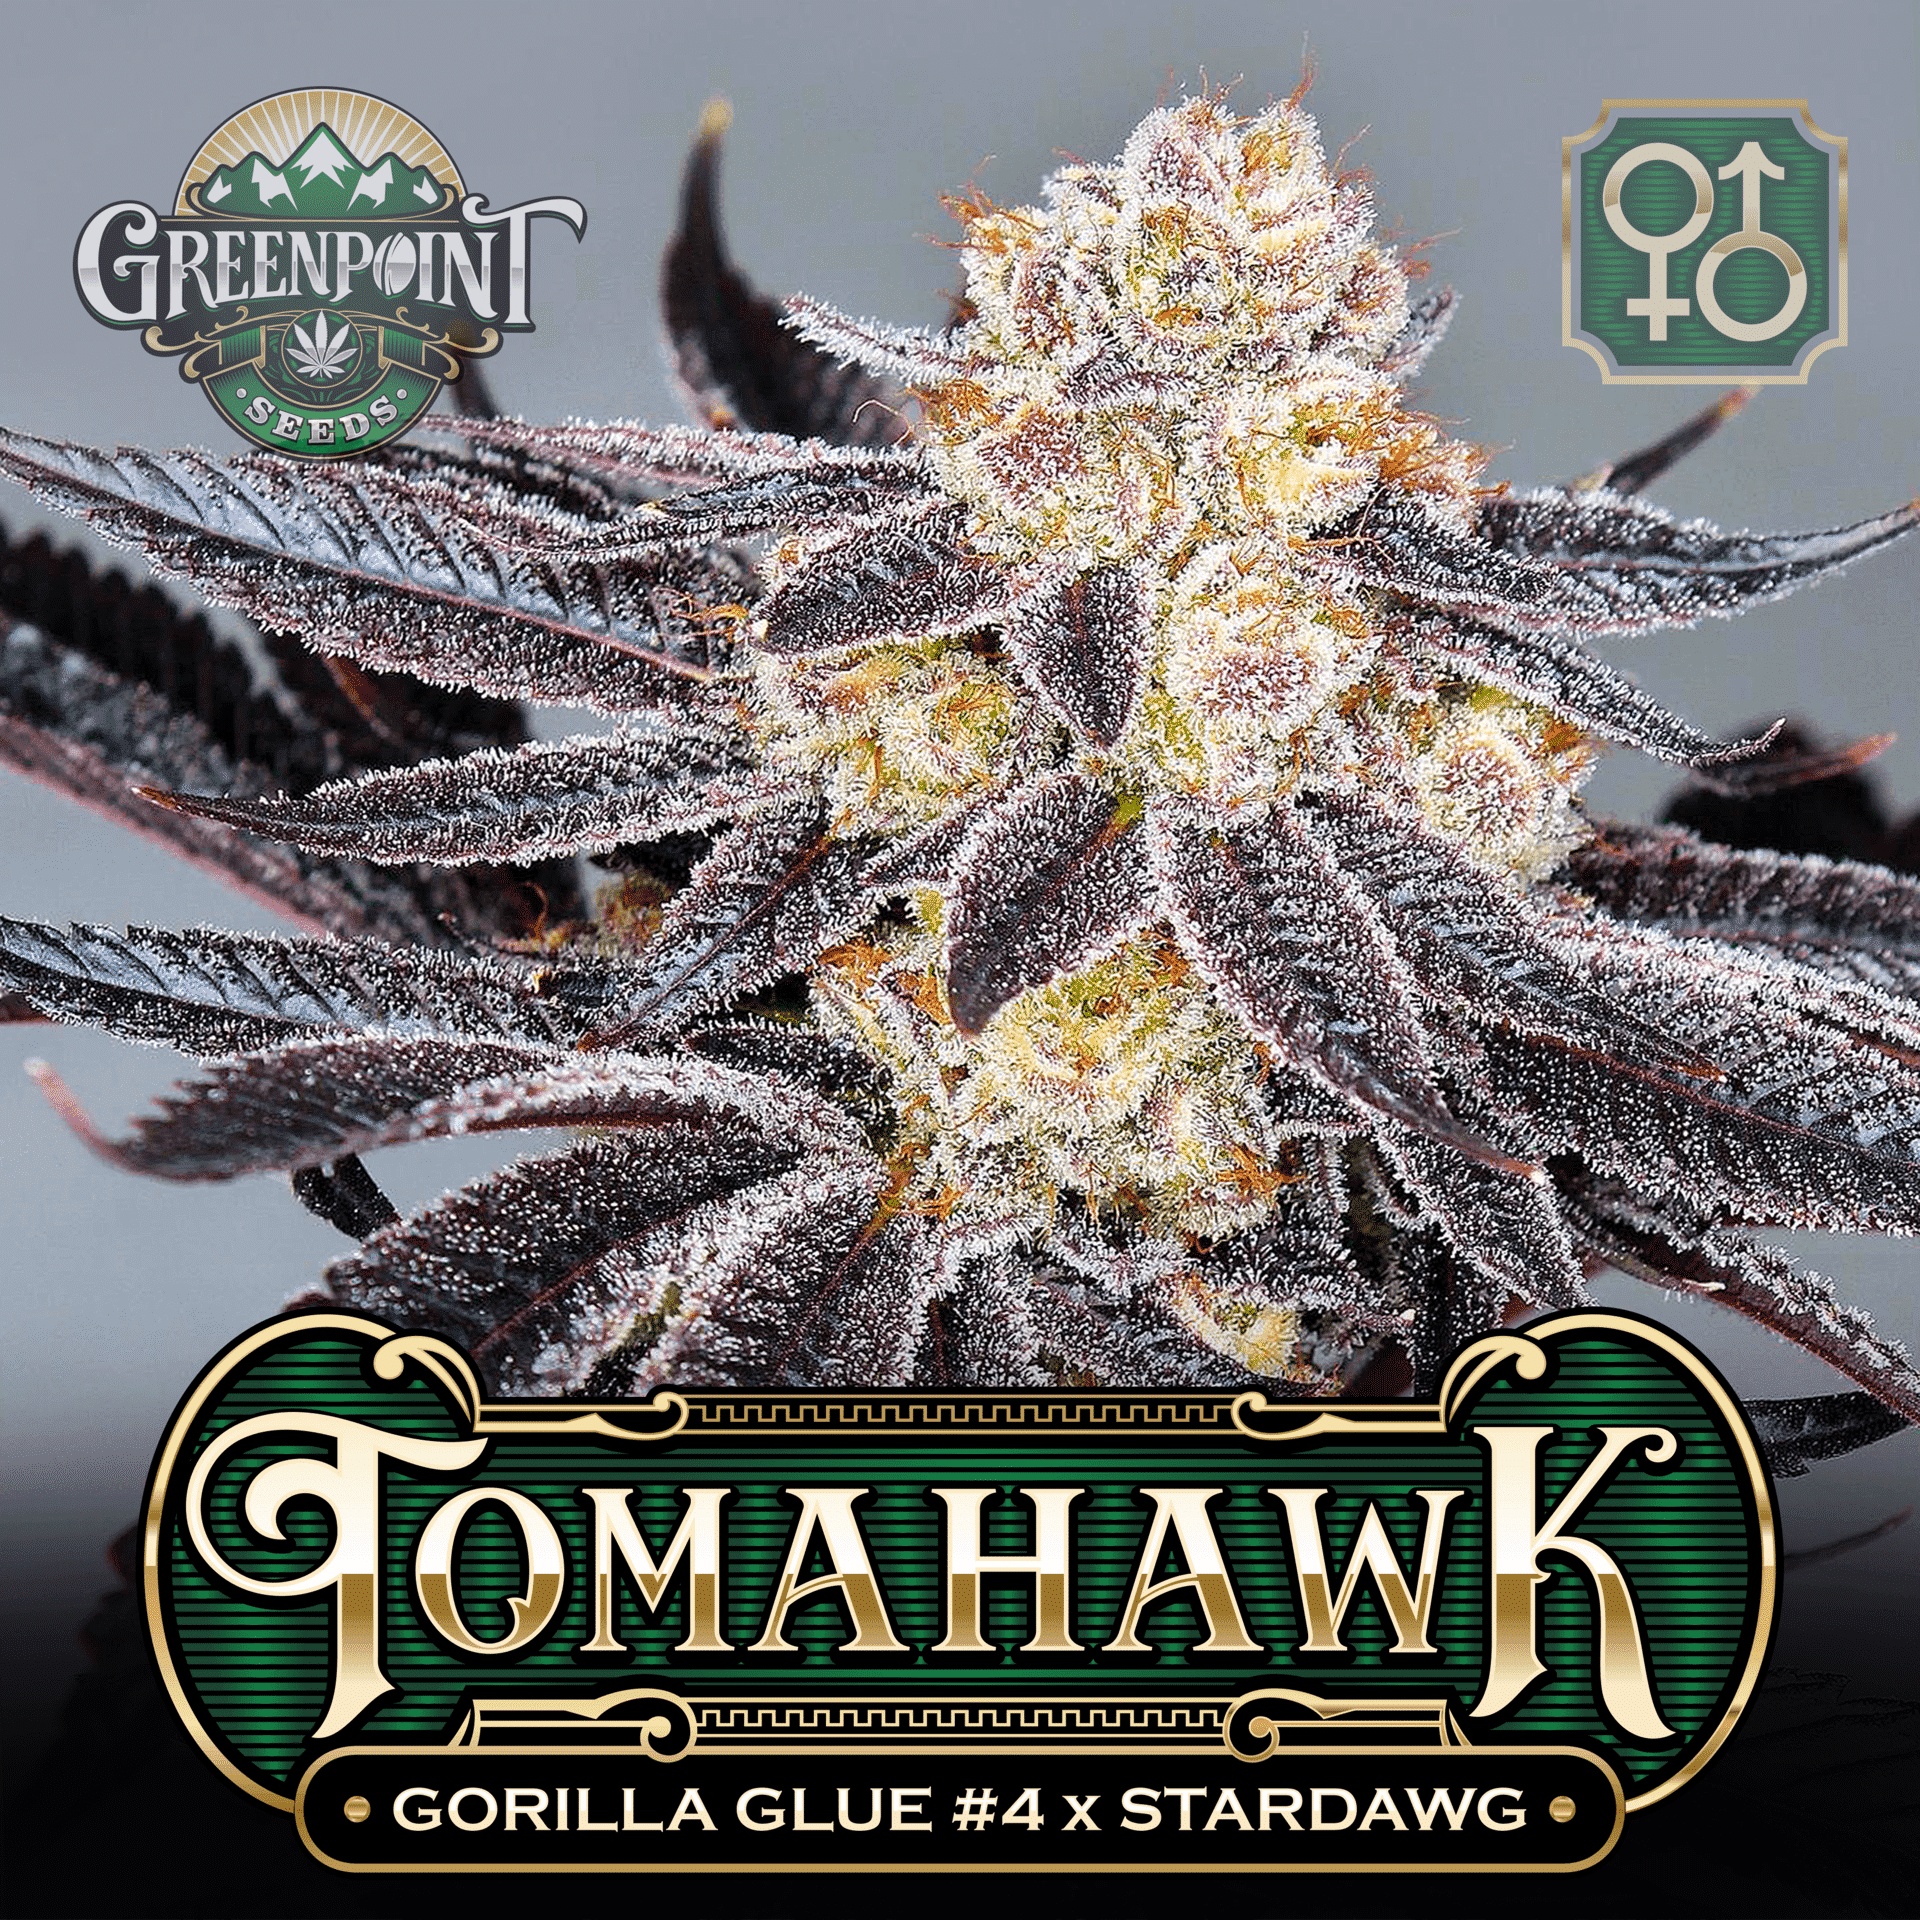 Tomahawk Seeds - Gorilla Glue #4 x Stardawg Strain   Greenpoint Seeds